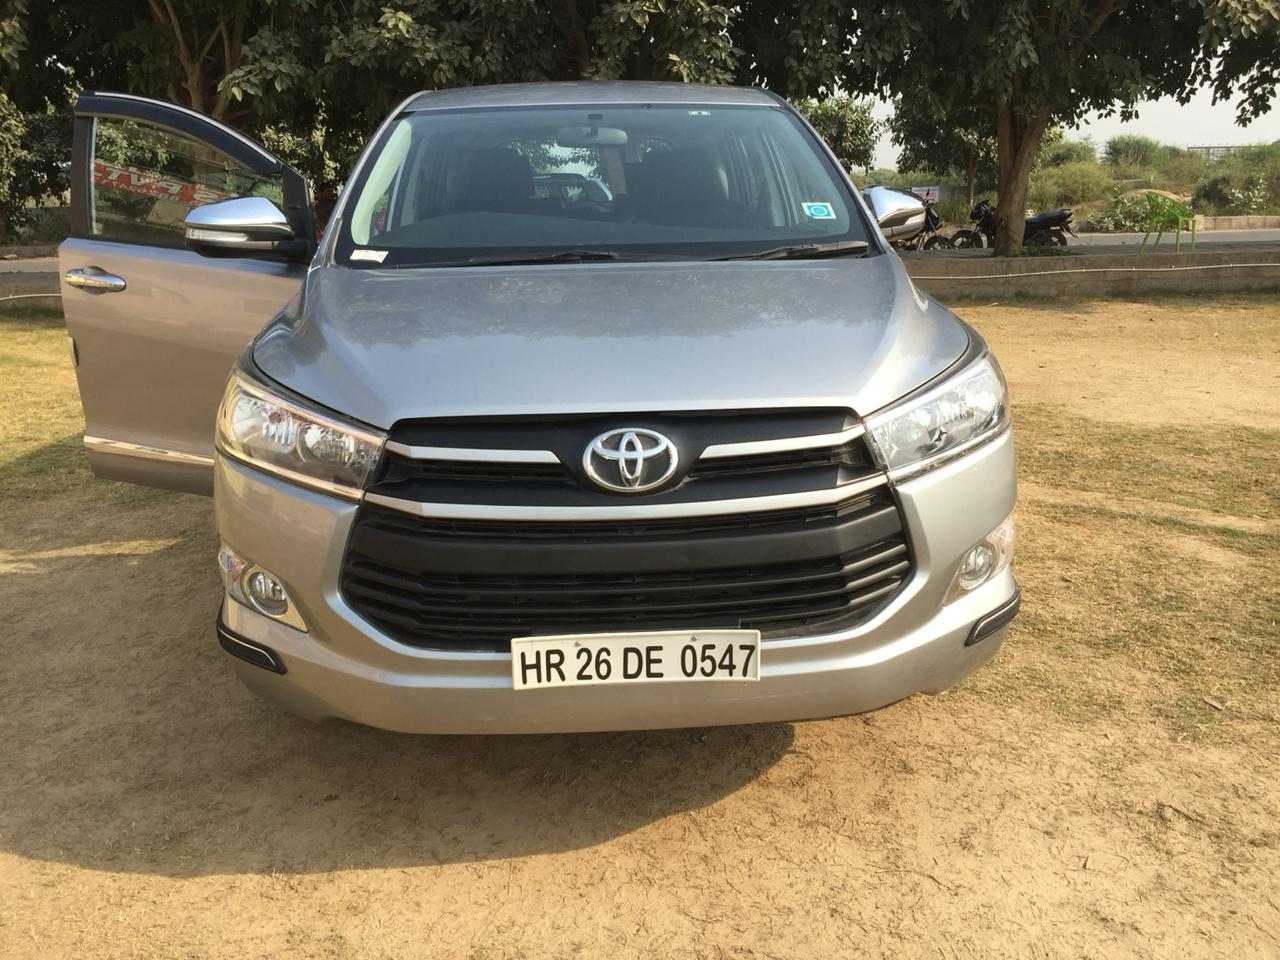 Secondhand Innova Crista-Gx car in Dwarka and Uttam Nagar